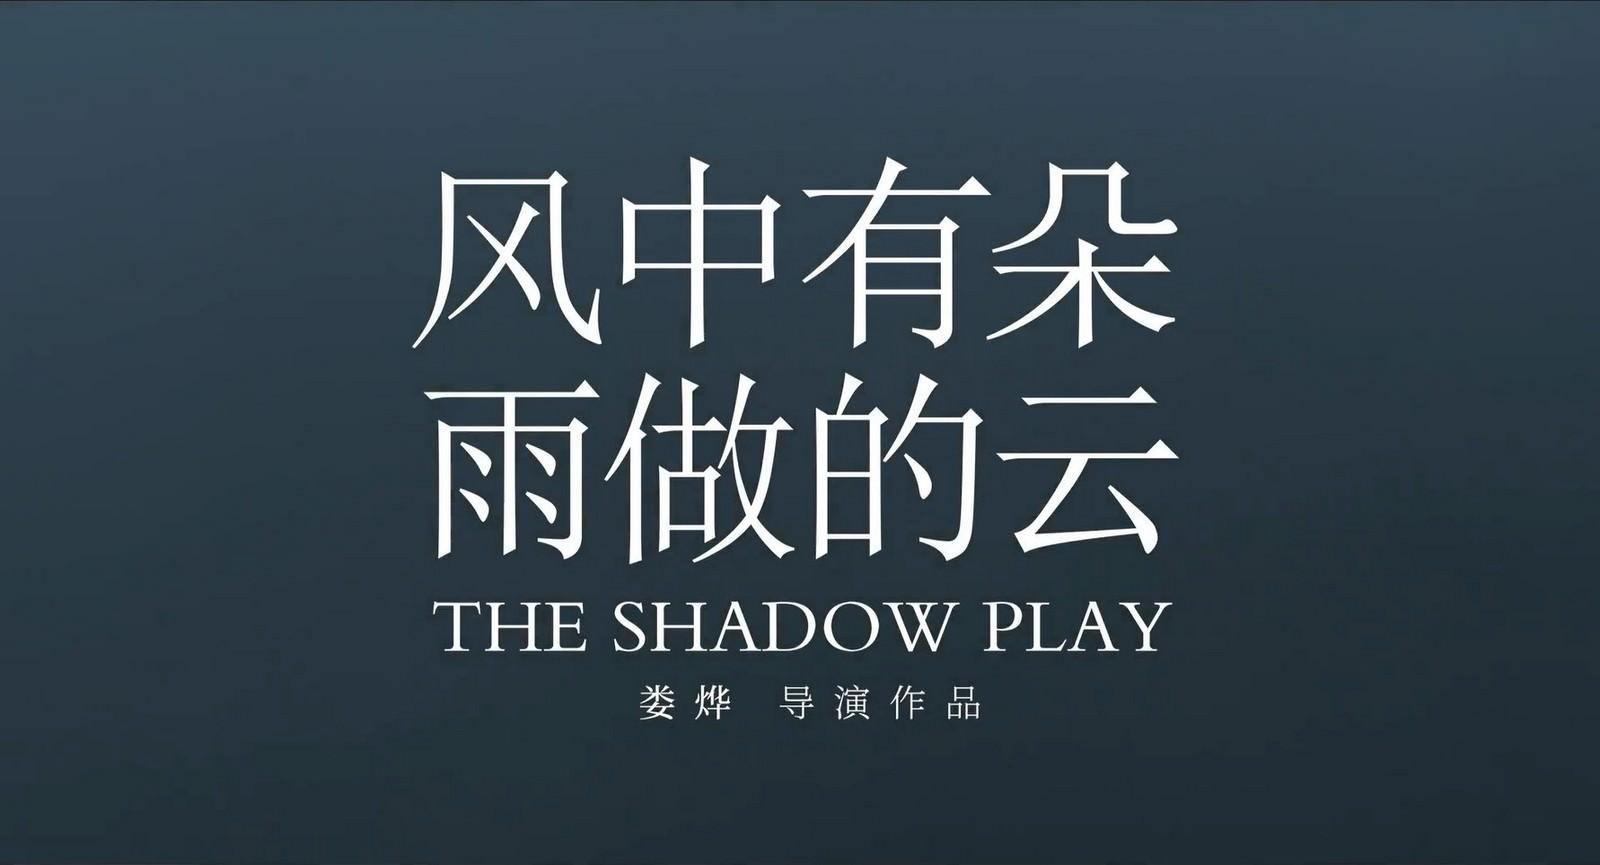 Movie, 风中有朵雨做的云(中國, 2018年) / 風中有朵雨做的雲(台灣) / Cloud in the Wind(英文) / The Shadow Play(英文), 電影海報, 中國, 橫版